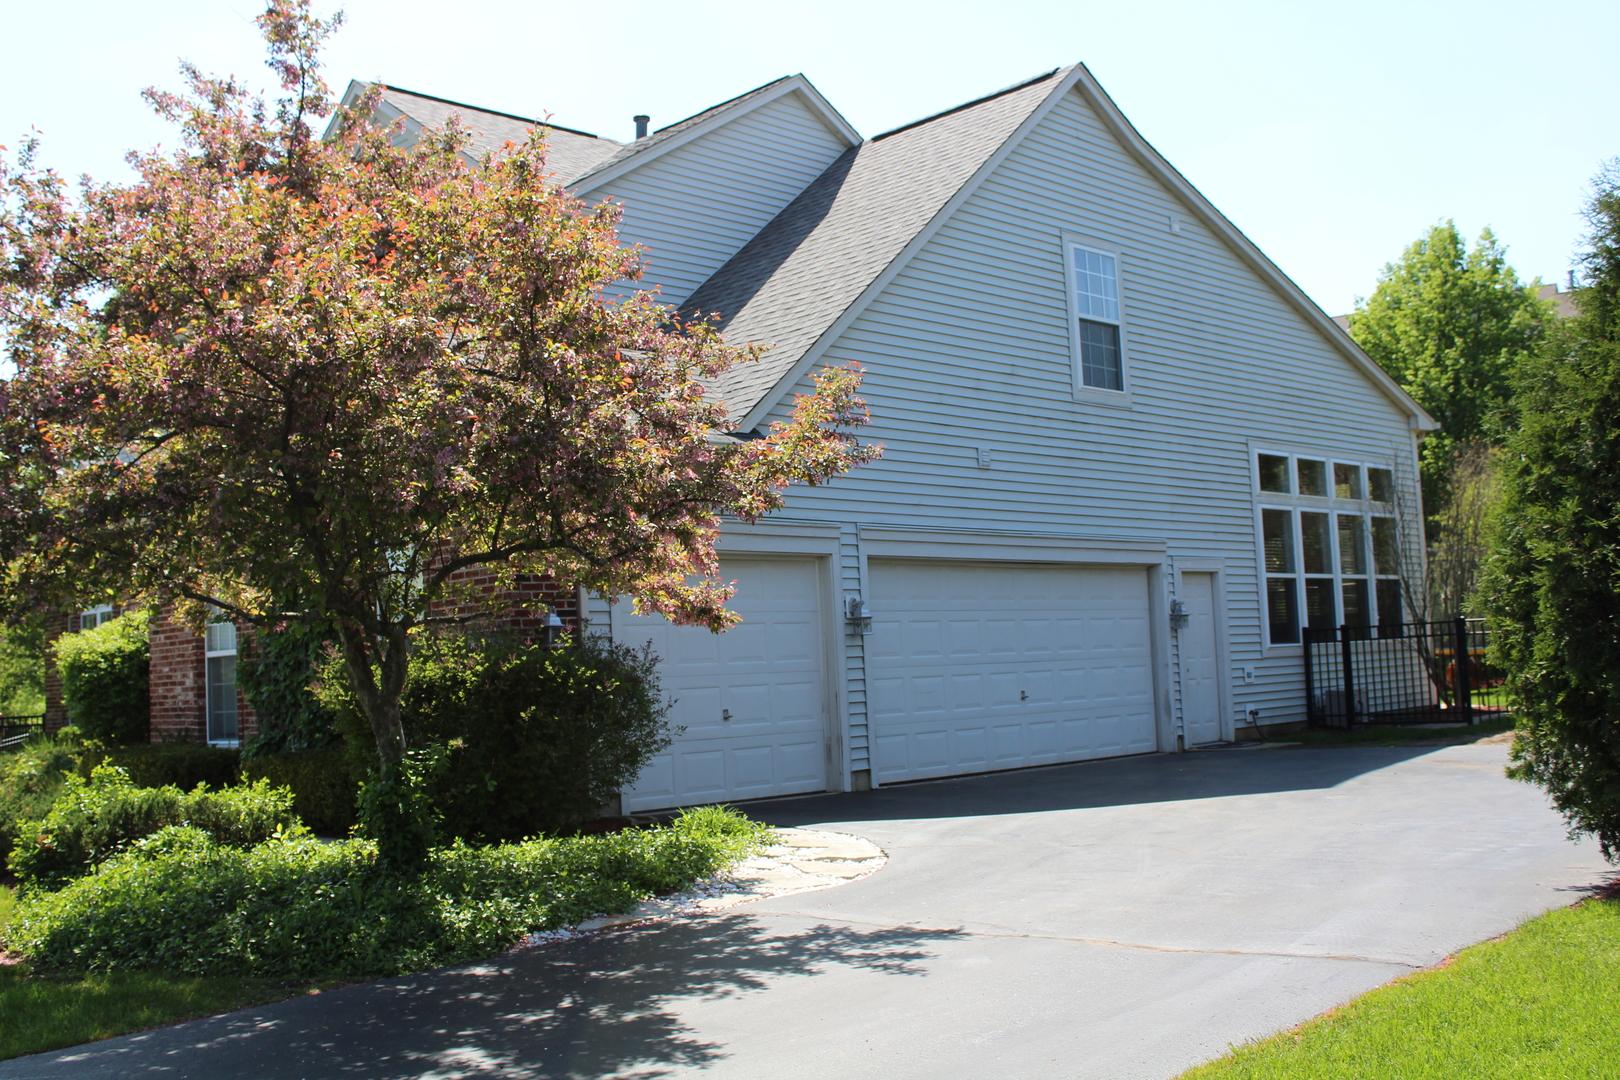 530 Brookside, Algonquin, Illinois, 60102